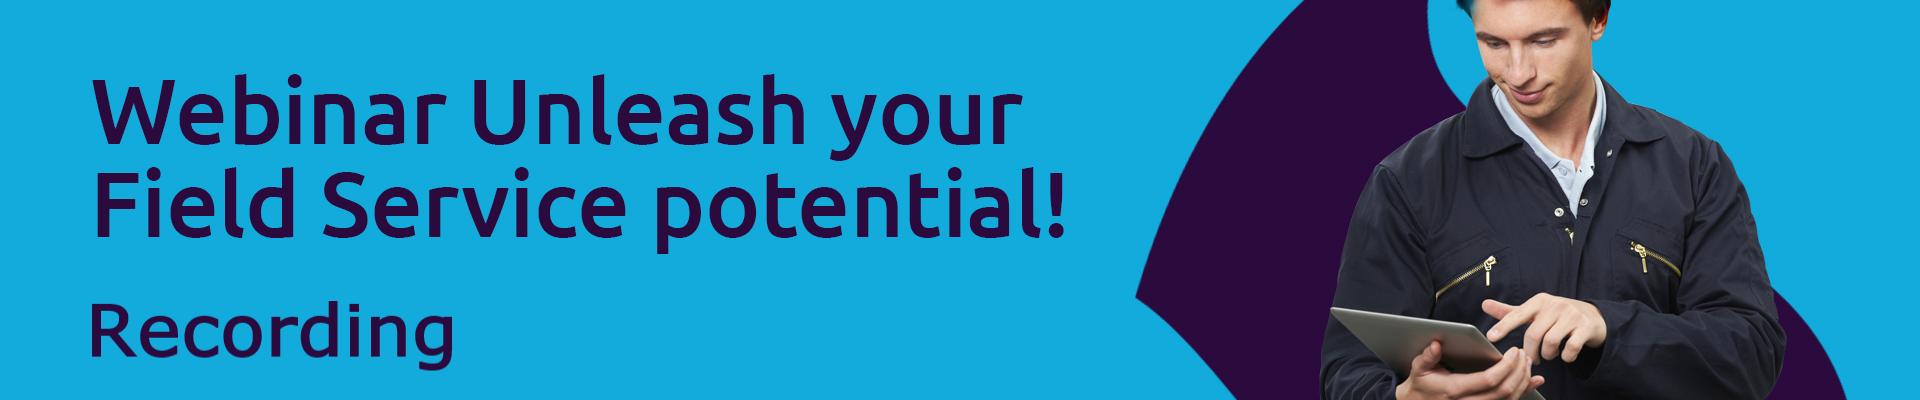 Unleash your Field Service potential!